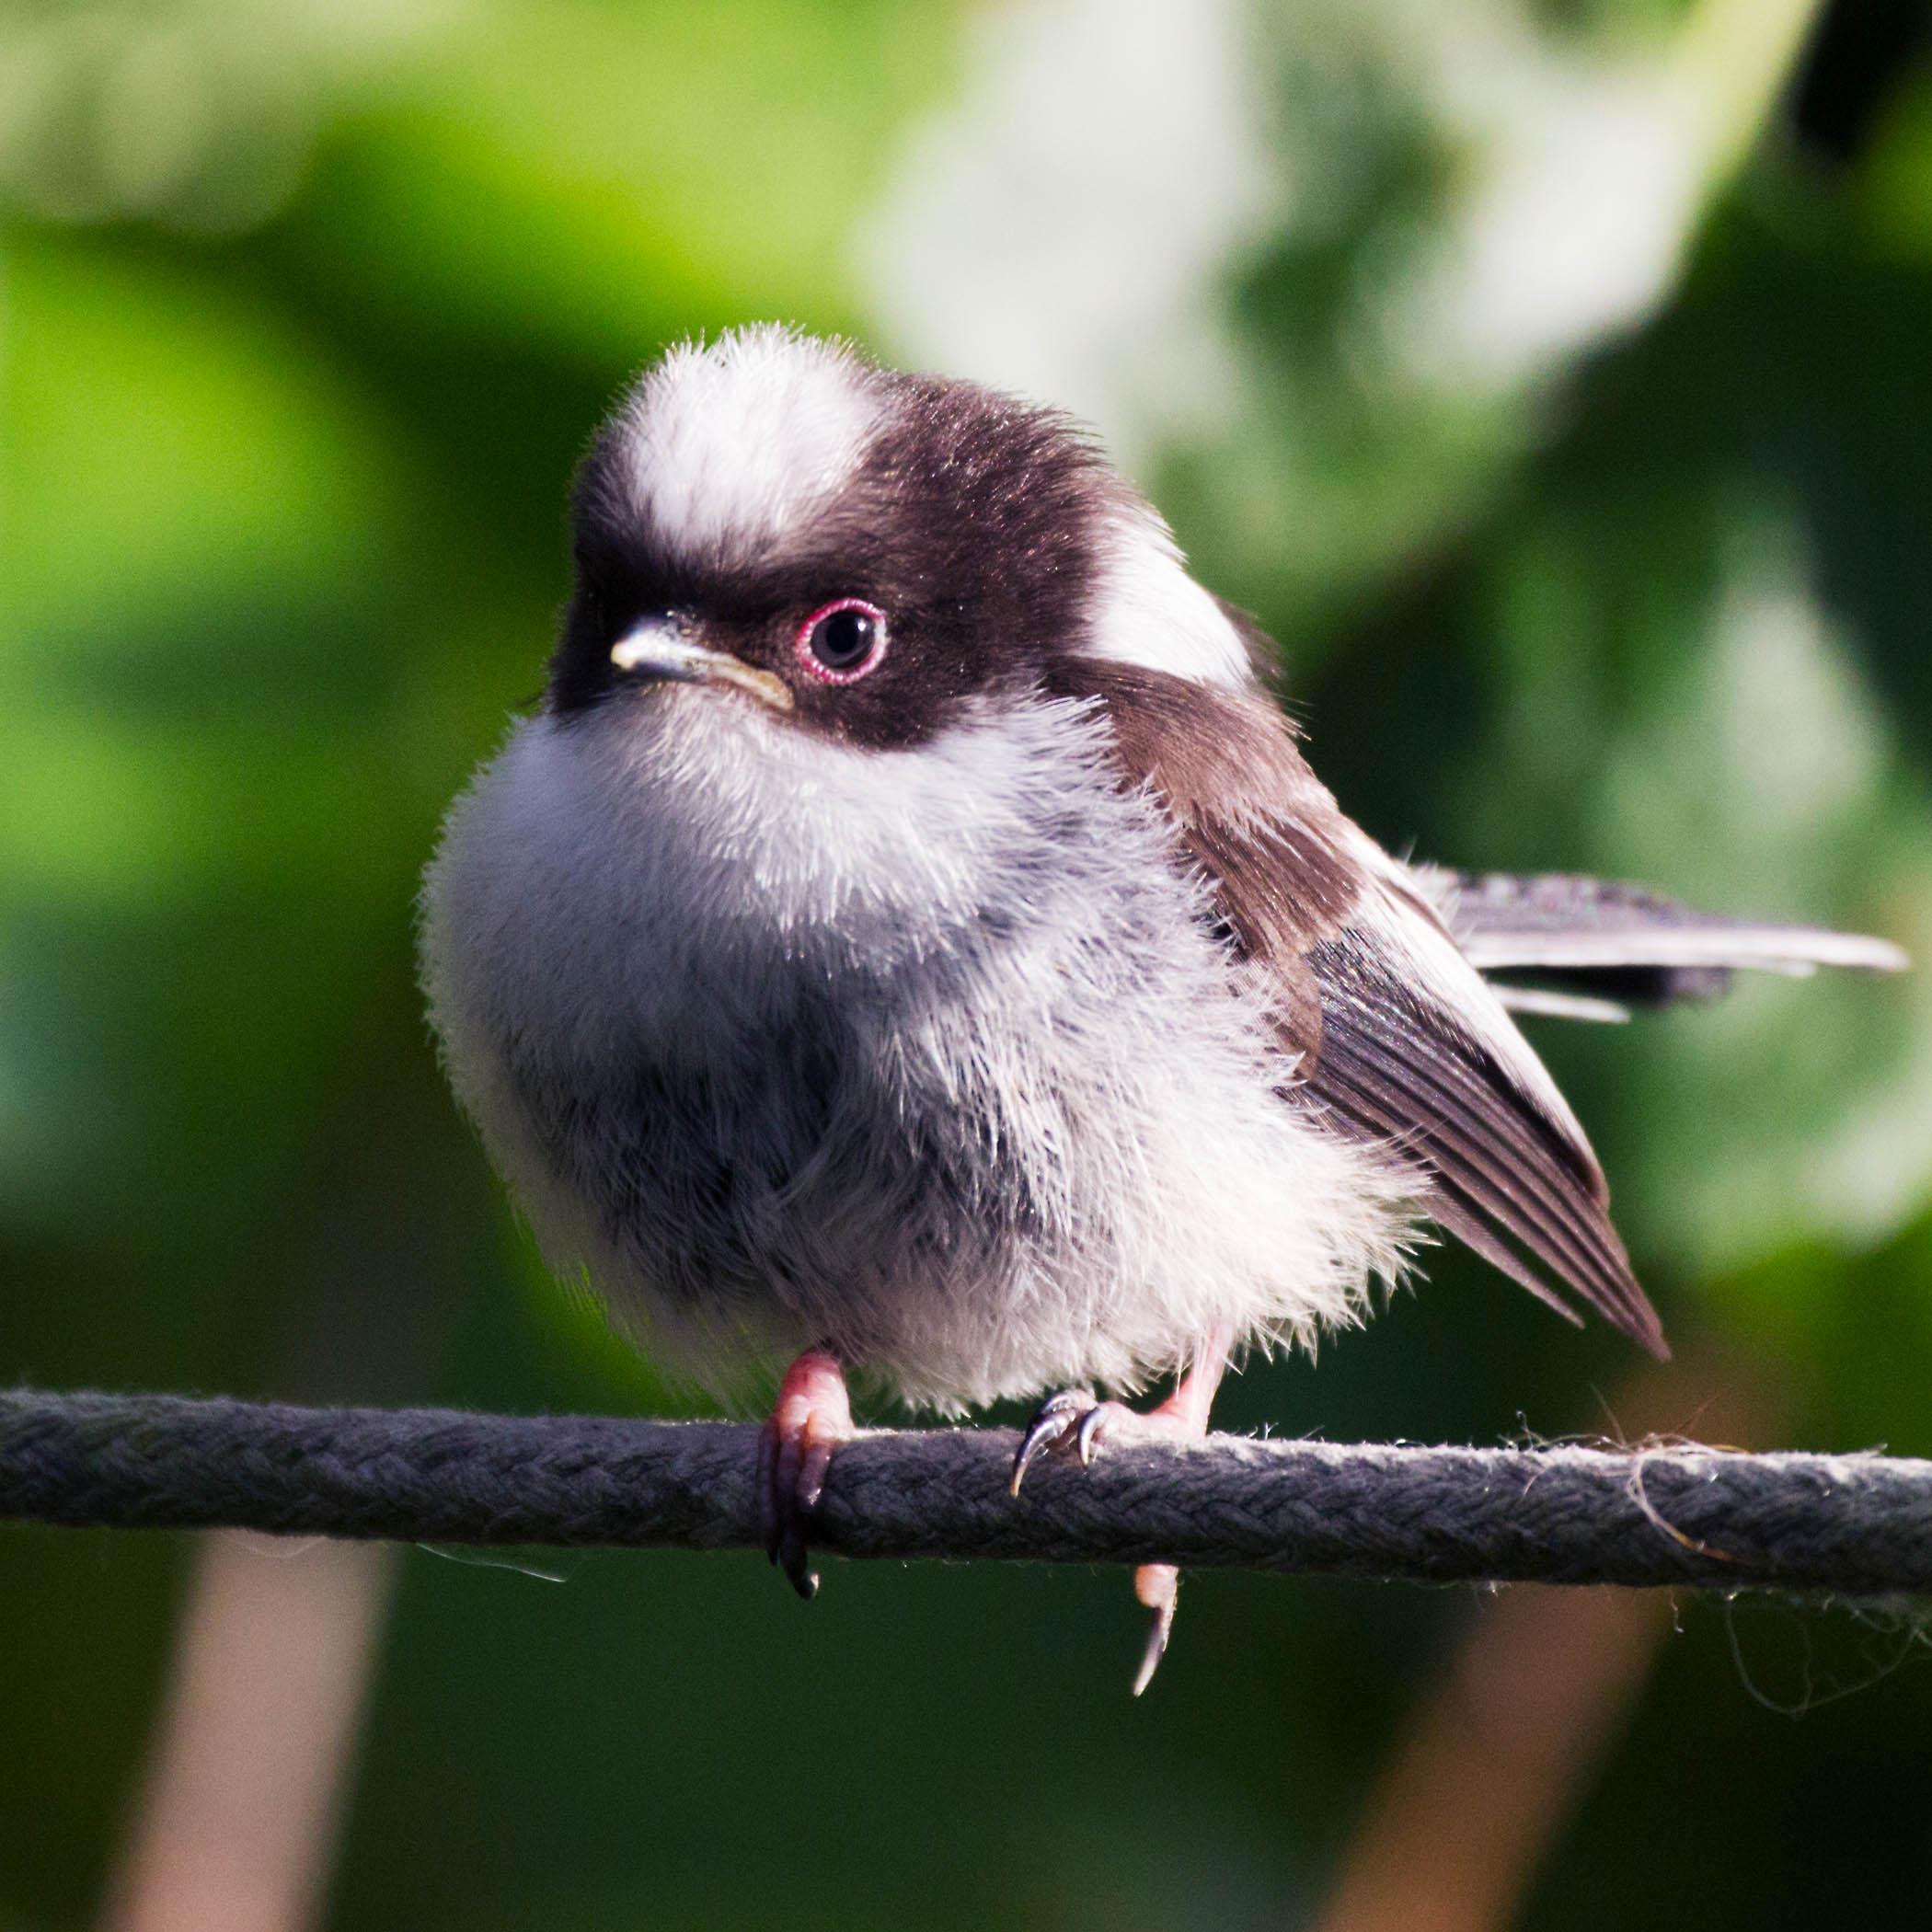 A long-tailed tit. ( Aegithalos caudatus). (C redit: Sarah Reece)